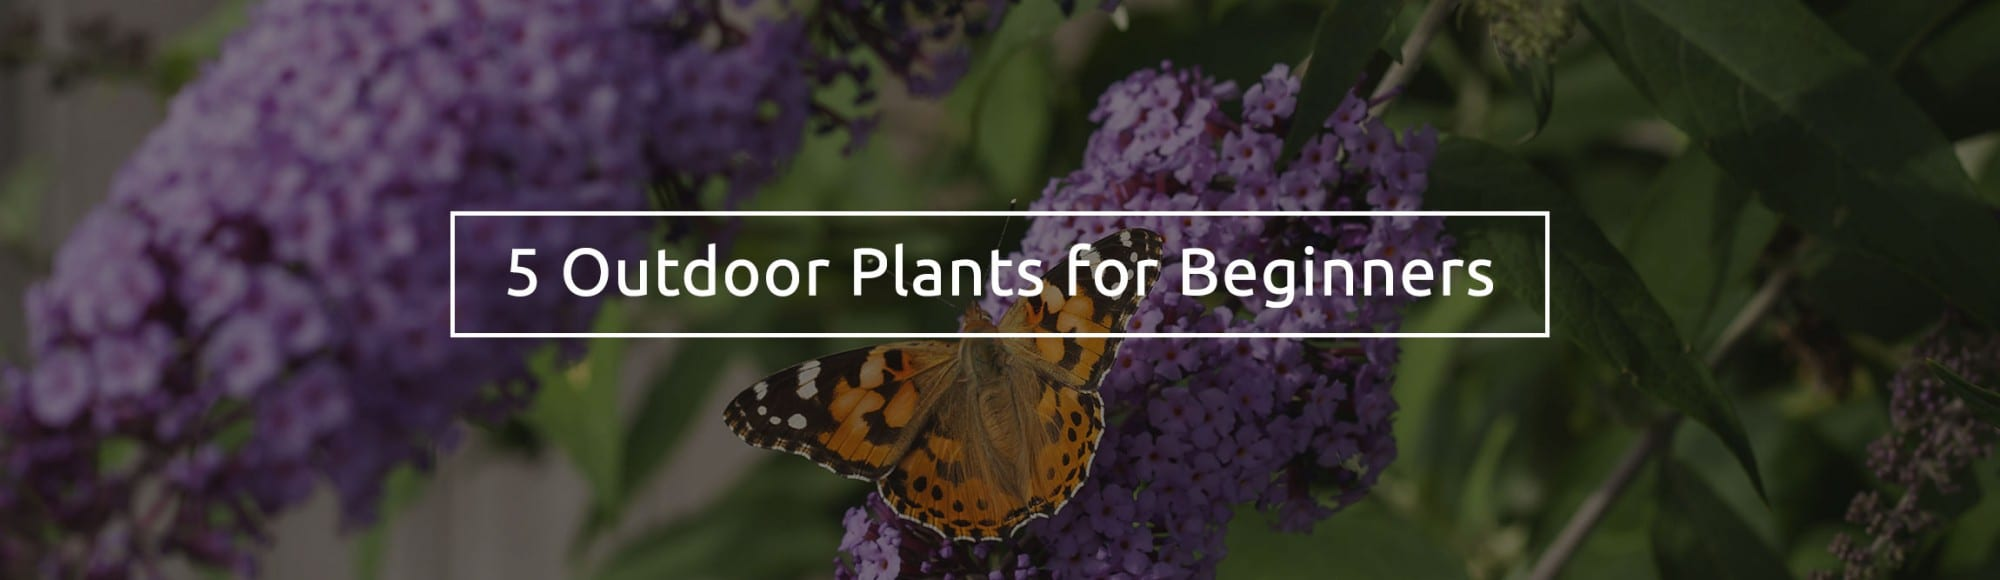 5-outdoor-plants-for-beginners